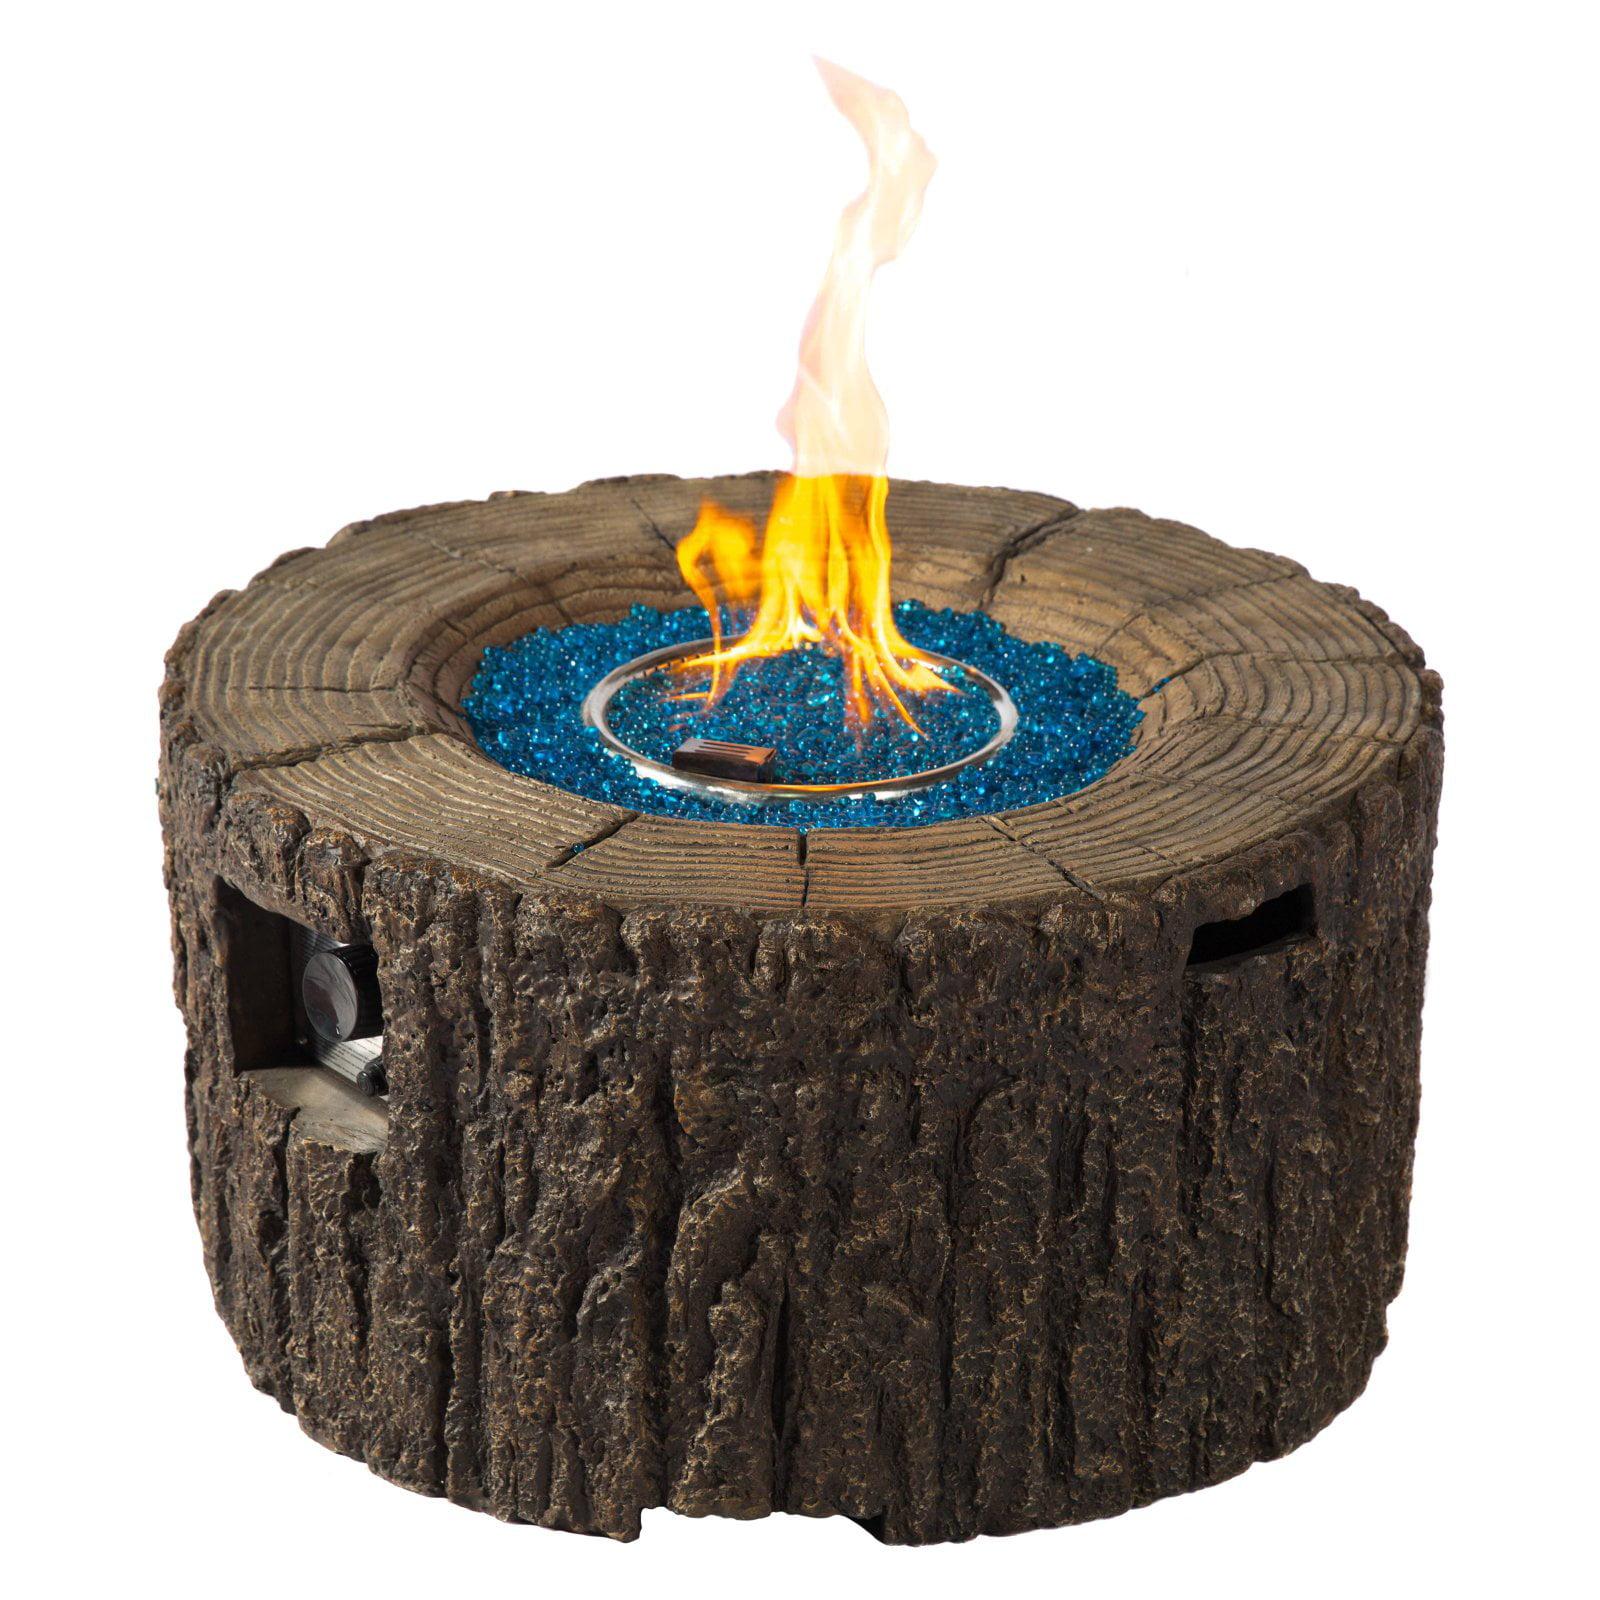 Mgo Wood Stump Fire Pit Walmart Com Walmart Com